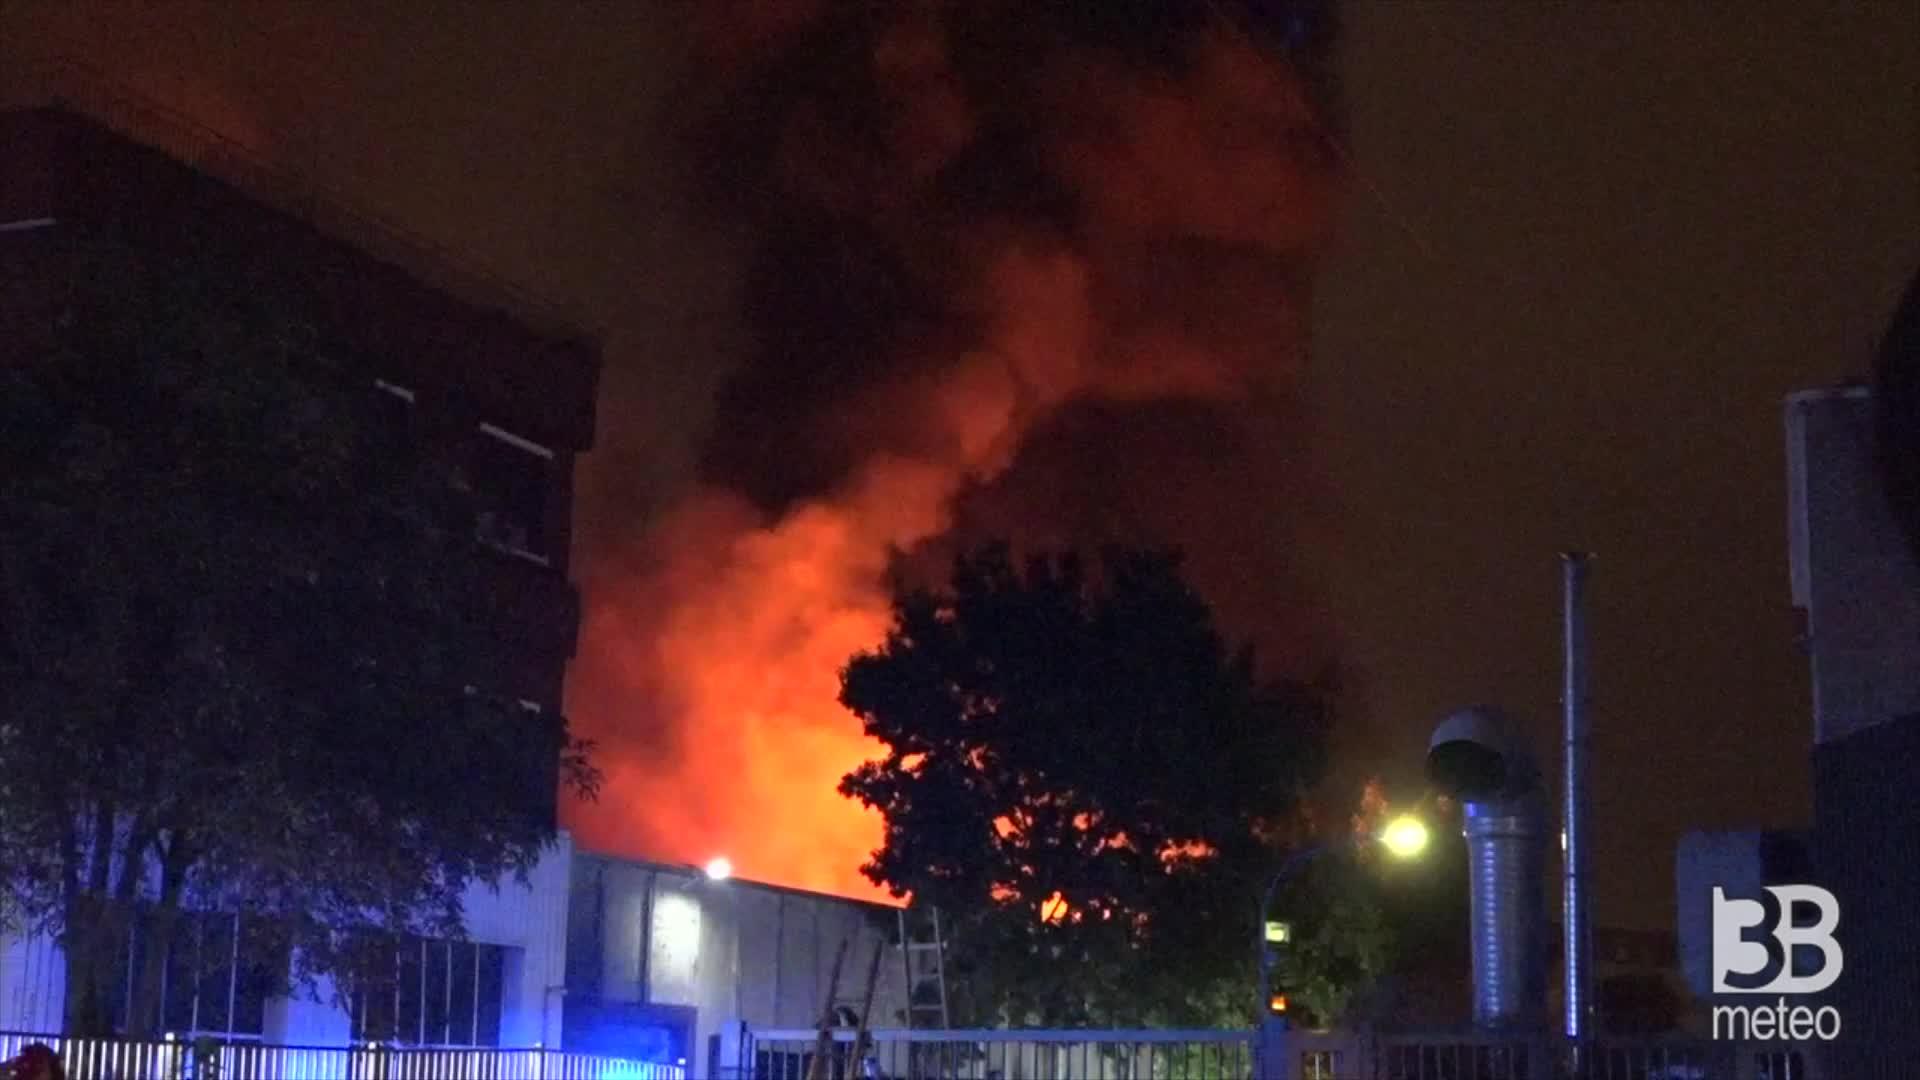 CRONACA DIRETTA - Monza, rogo fabbrica mascherine: oltre 10 mezzi vvff, evacuazioni - VIDEO